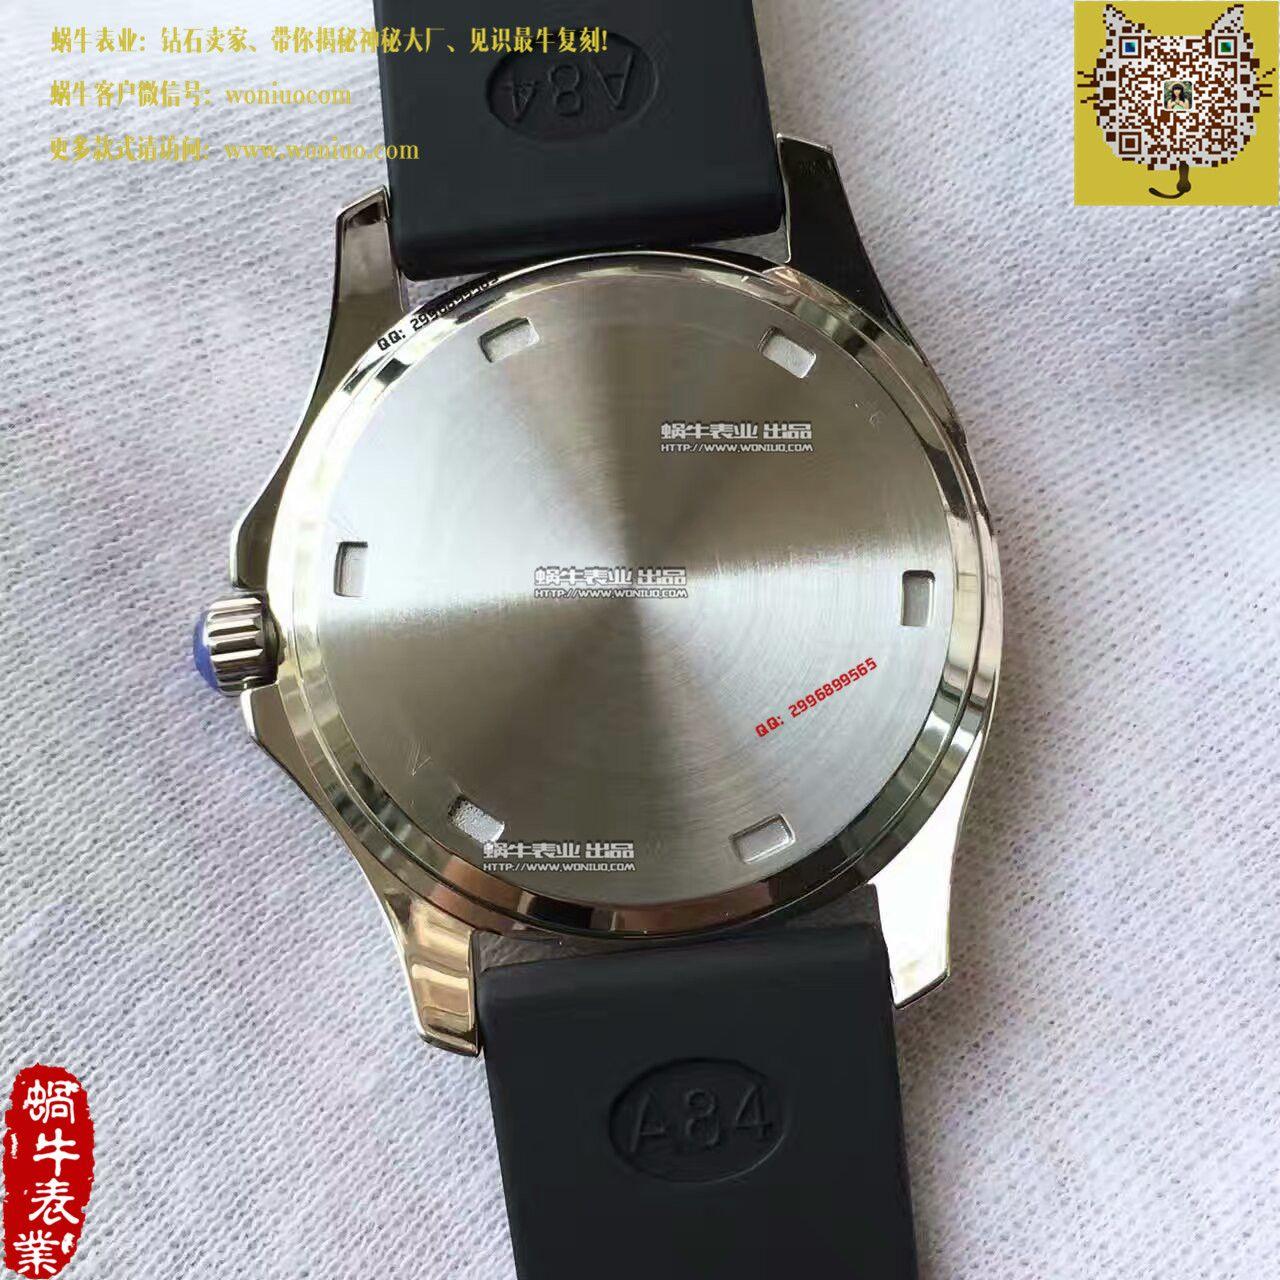 【BP一比一精仿手表】百达翡丽AQUANAUT系列5067A-001 女士腕表